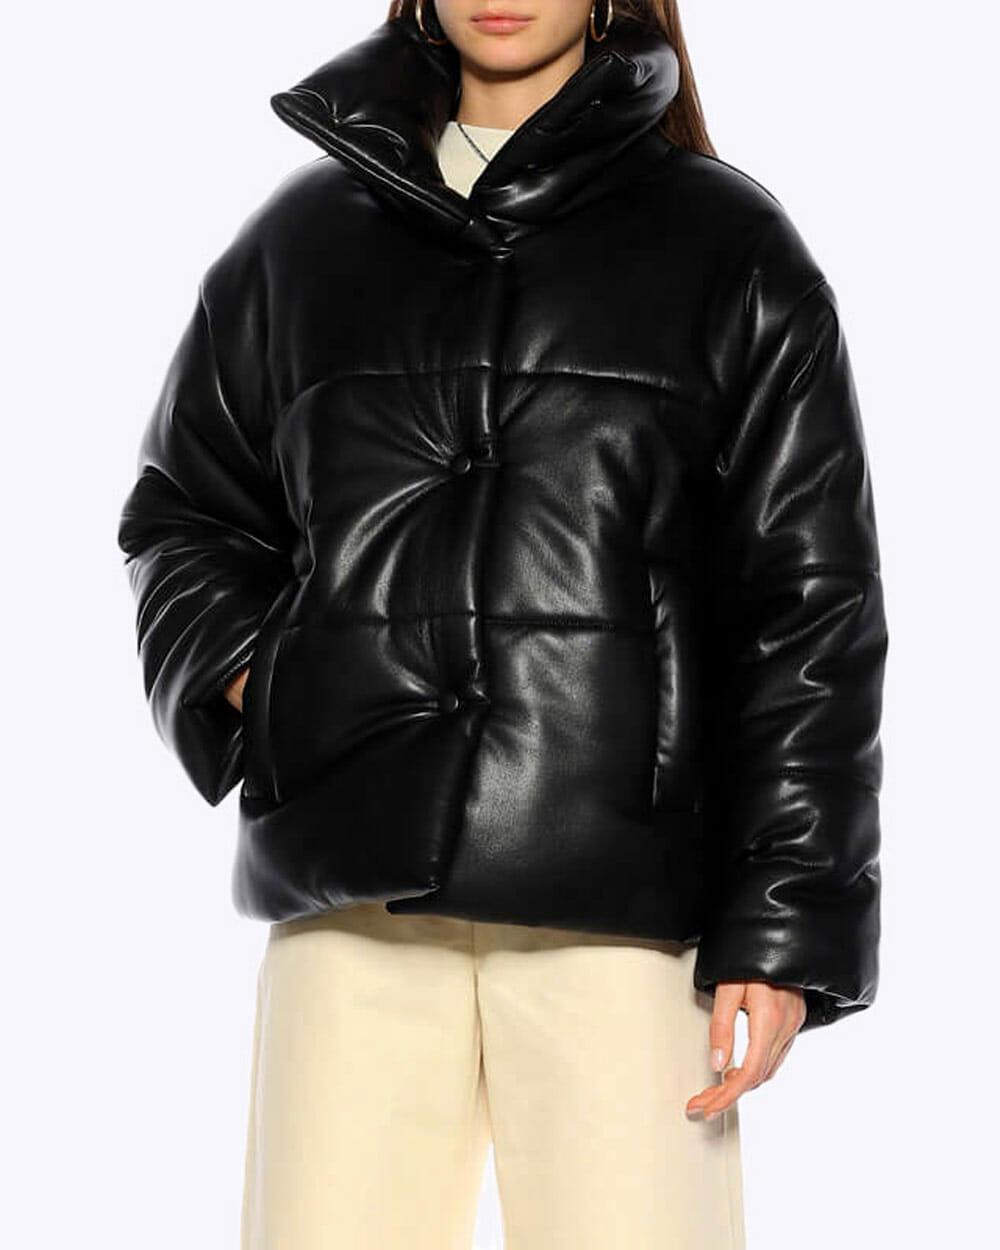 Nanushka vegan leather puffer jacket